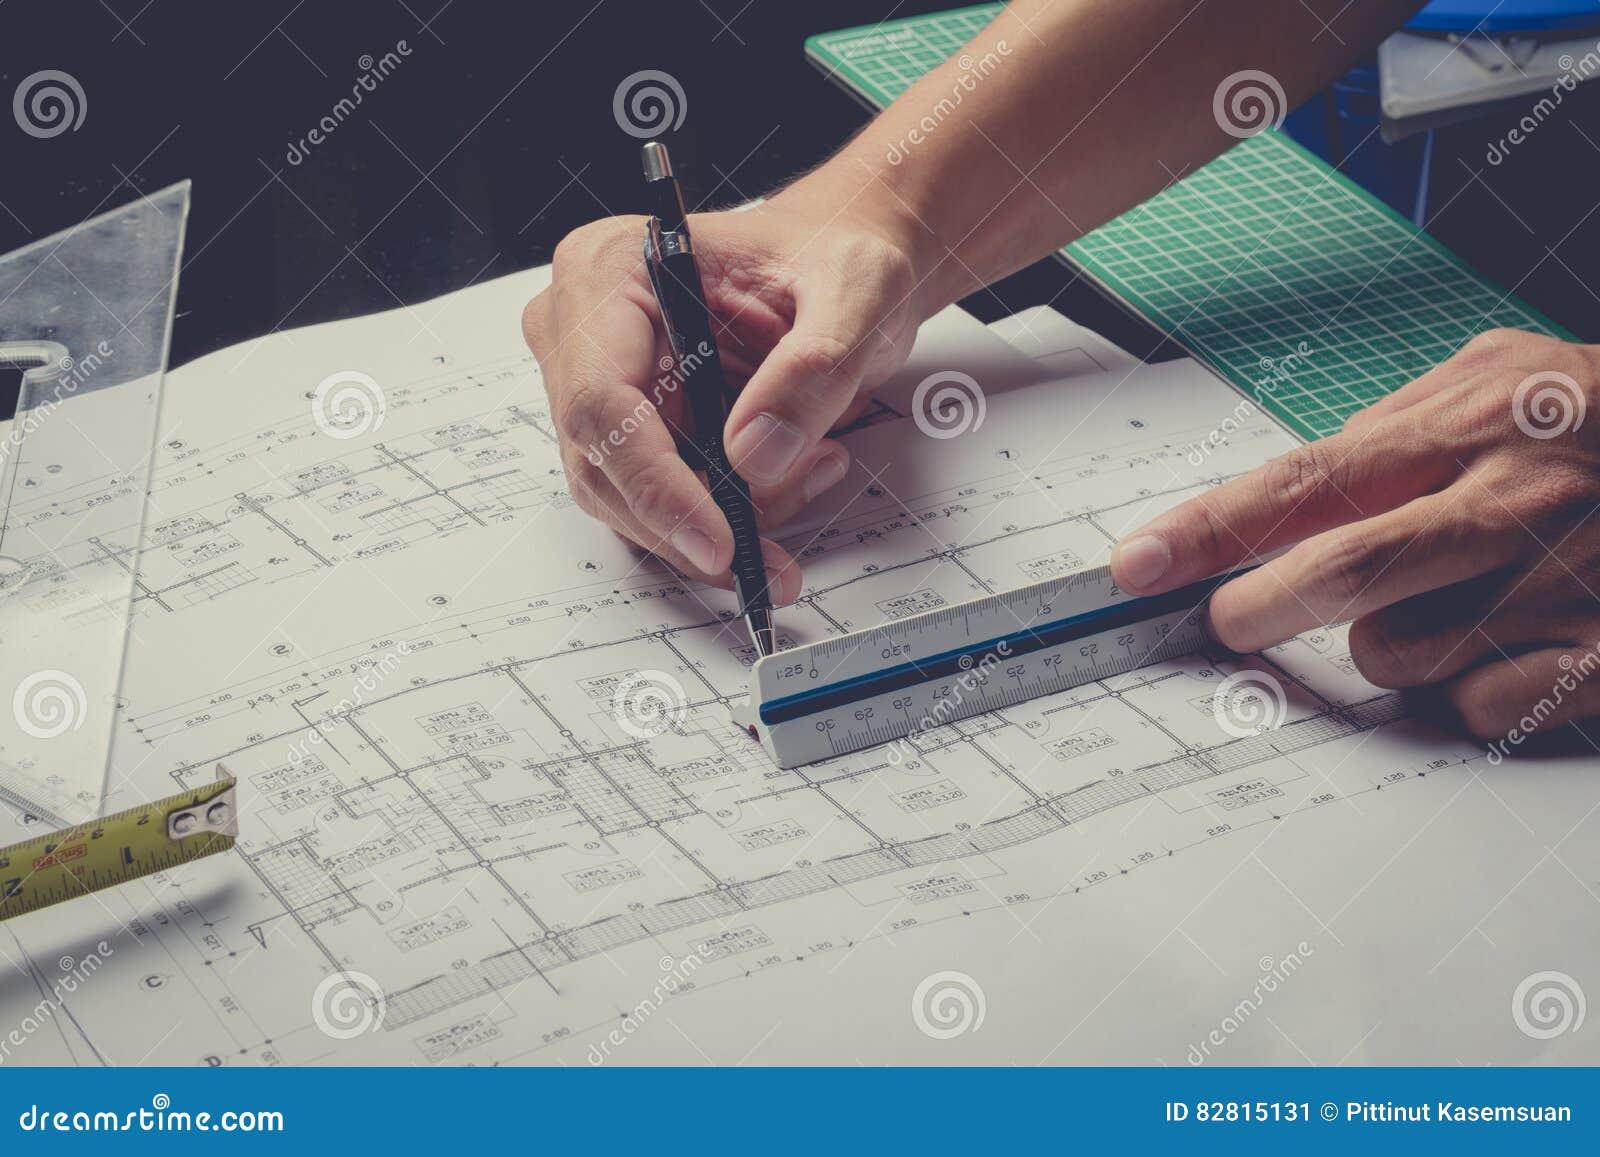 Engineering diagram blueprint paper drafting project stock image engineering diagram blueprint paper drafting project royalty free stock photo malvernweather Choice Image